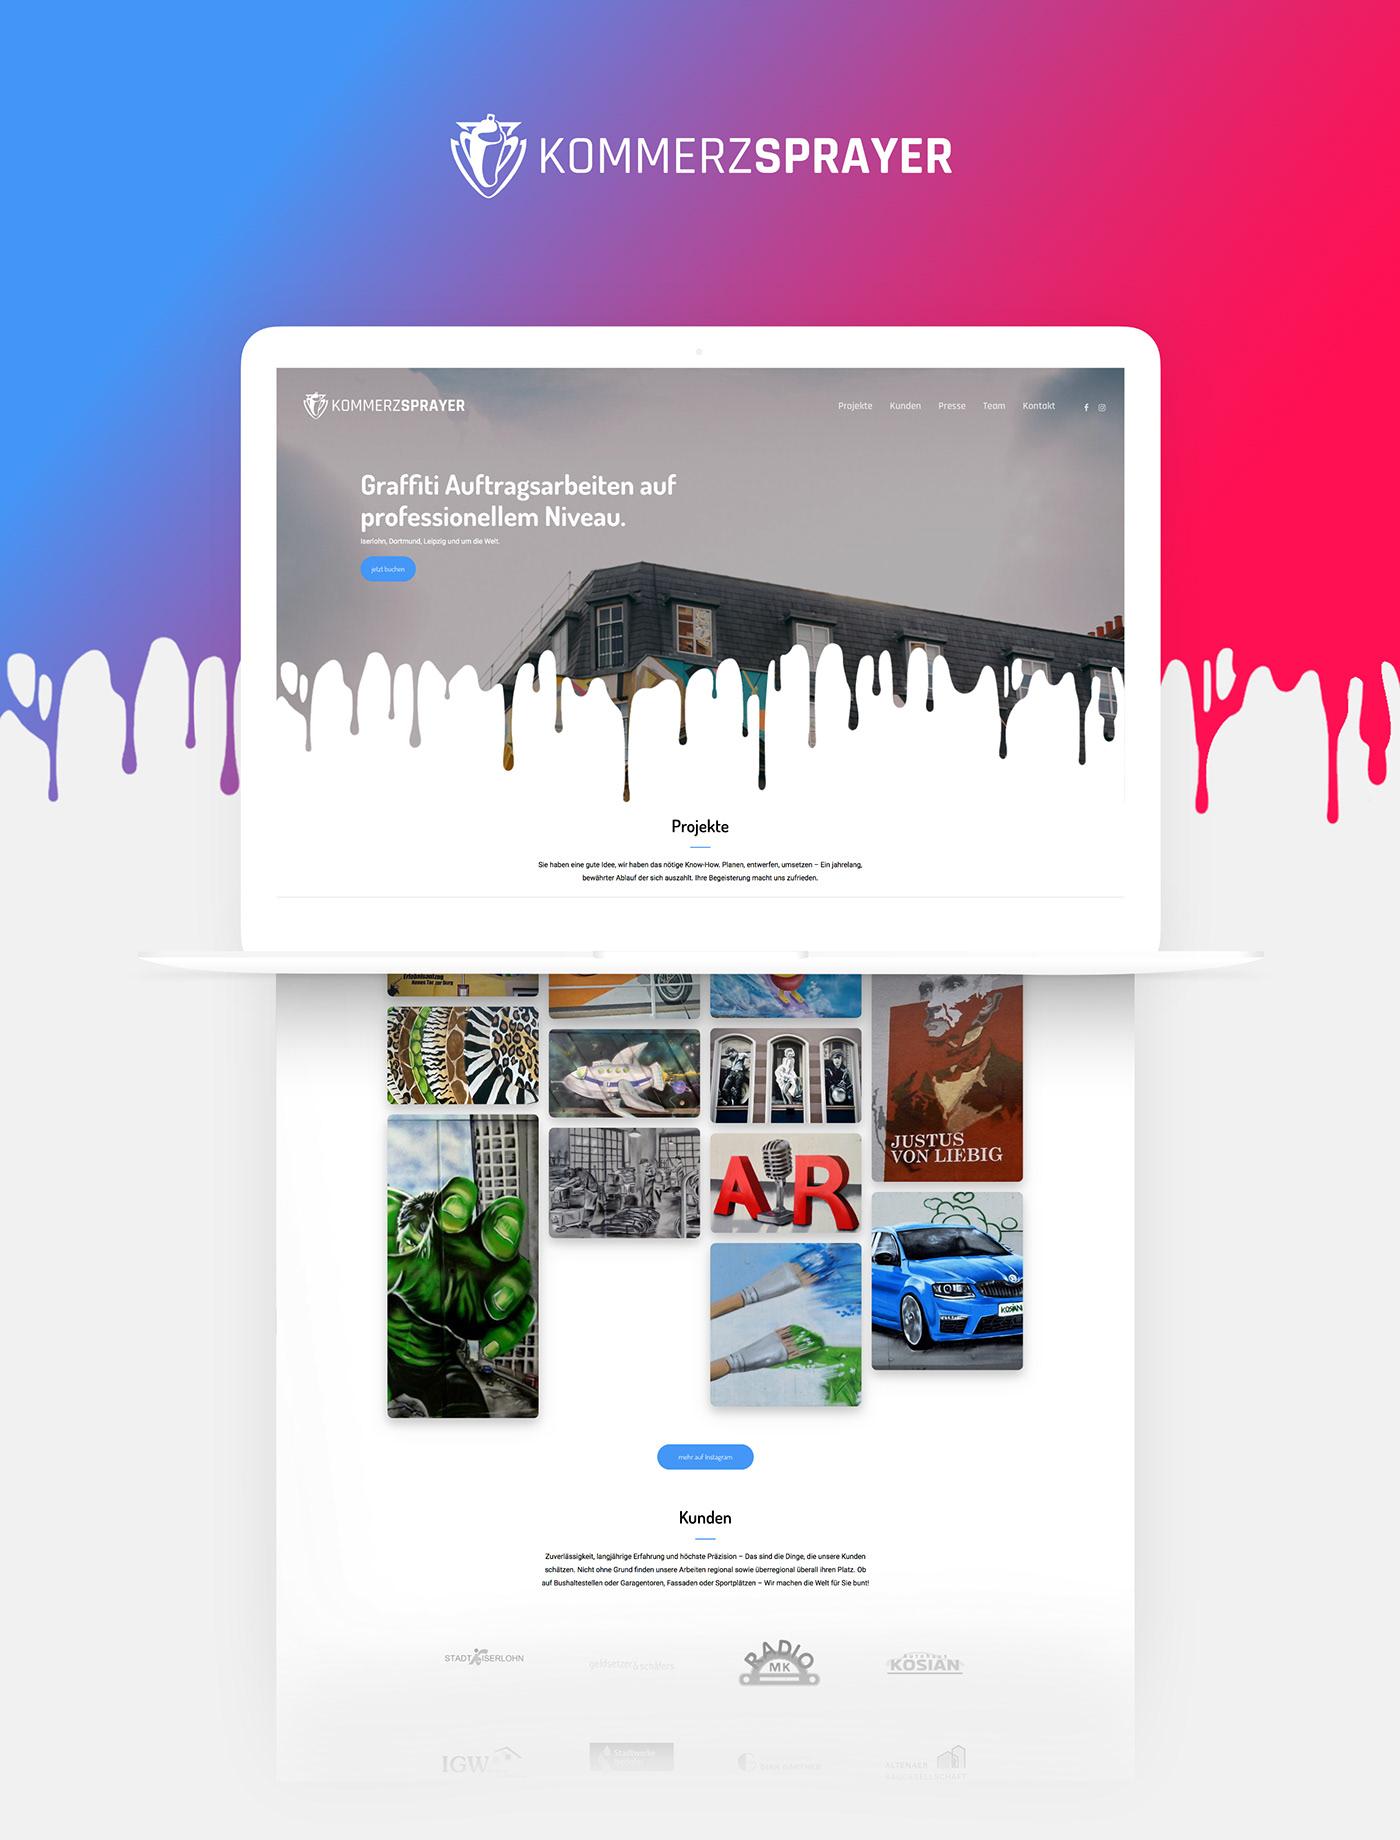 Graffiti,UI/UX,print,branding ,logo,wordpress,user interface,Corporate Design